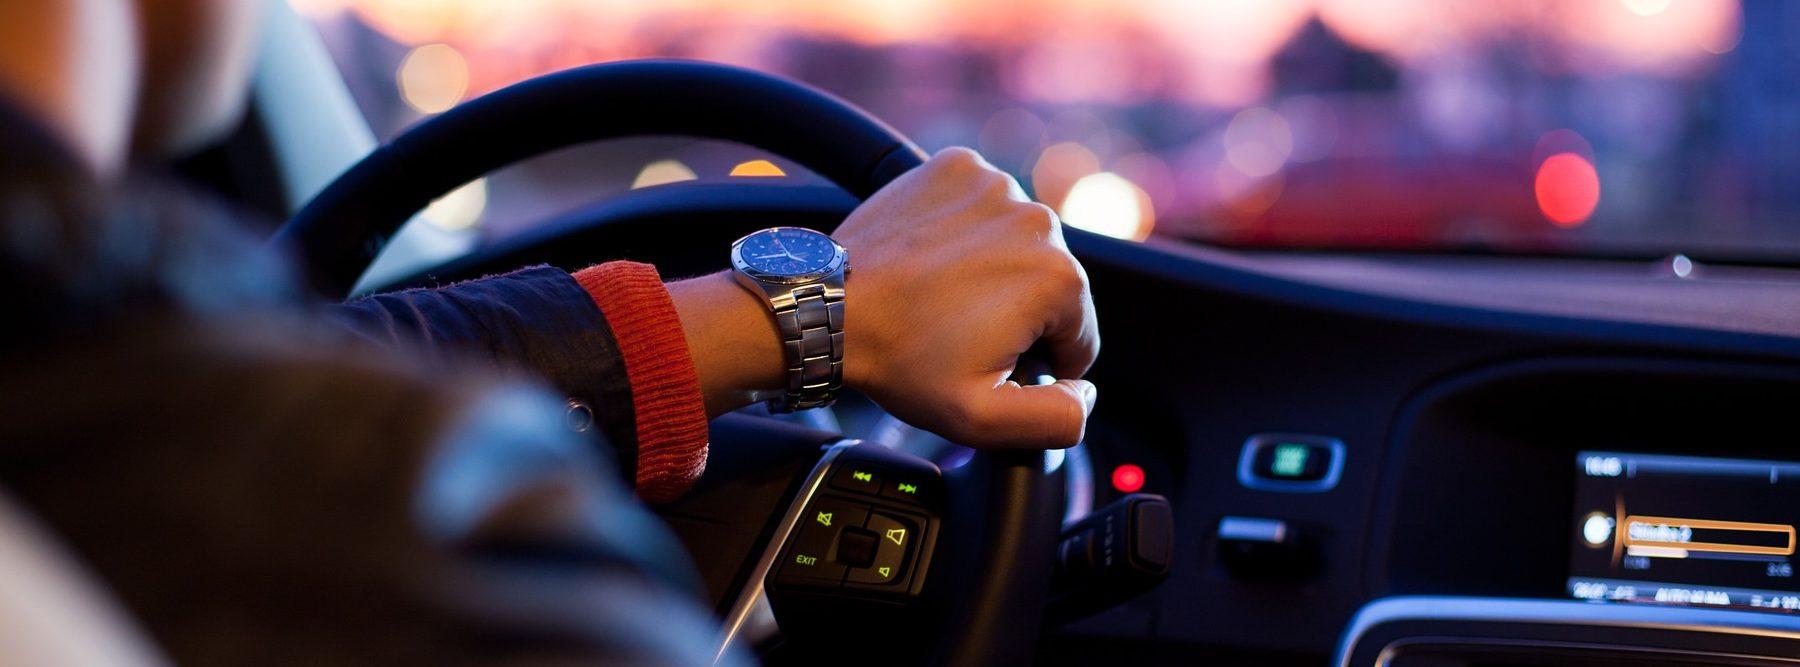 Volvo impedirá conducir en estado de embriaguez en 2020